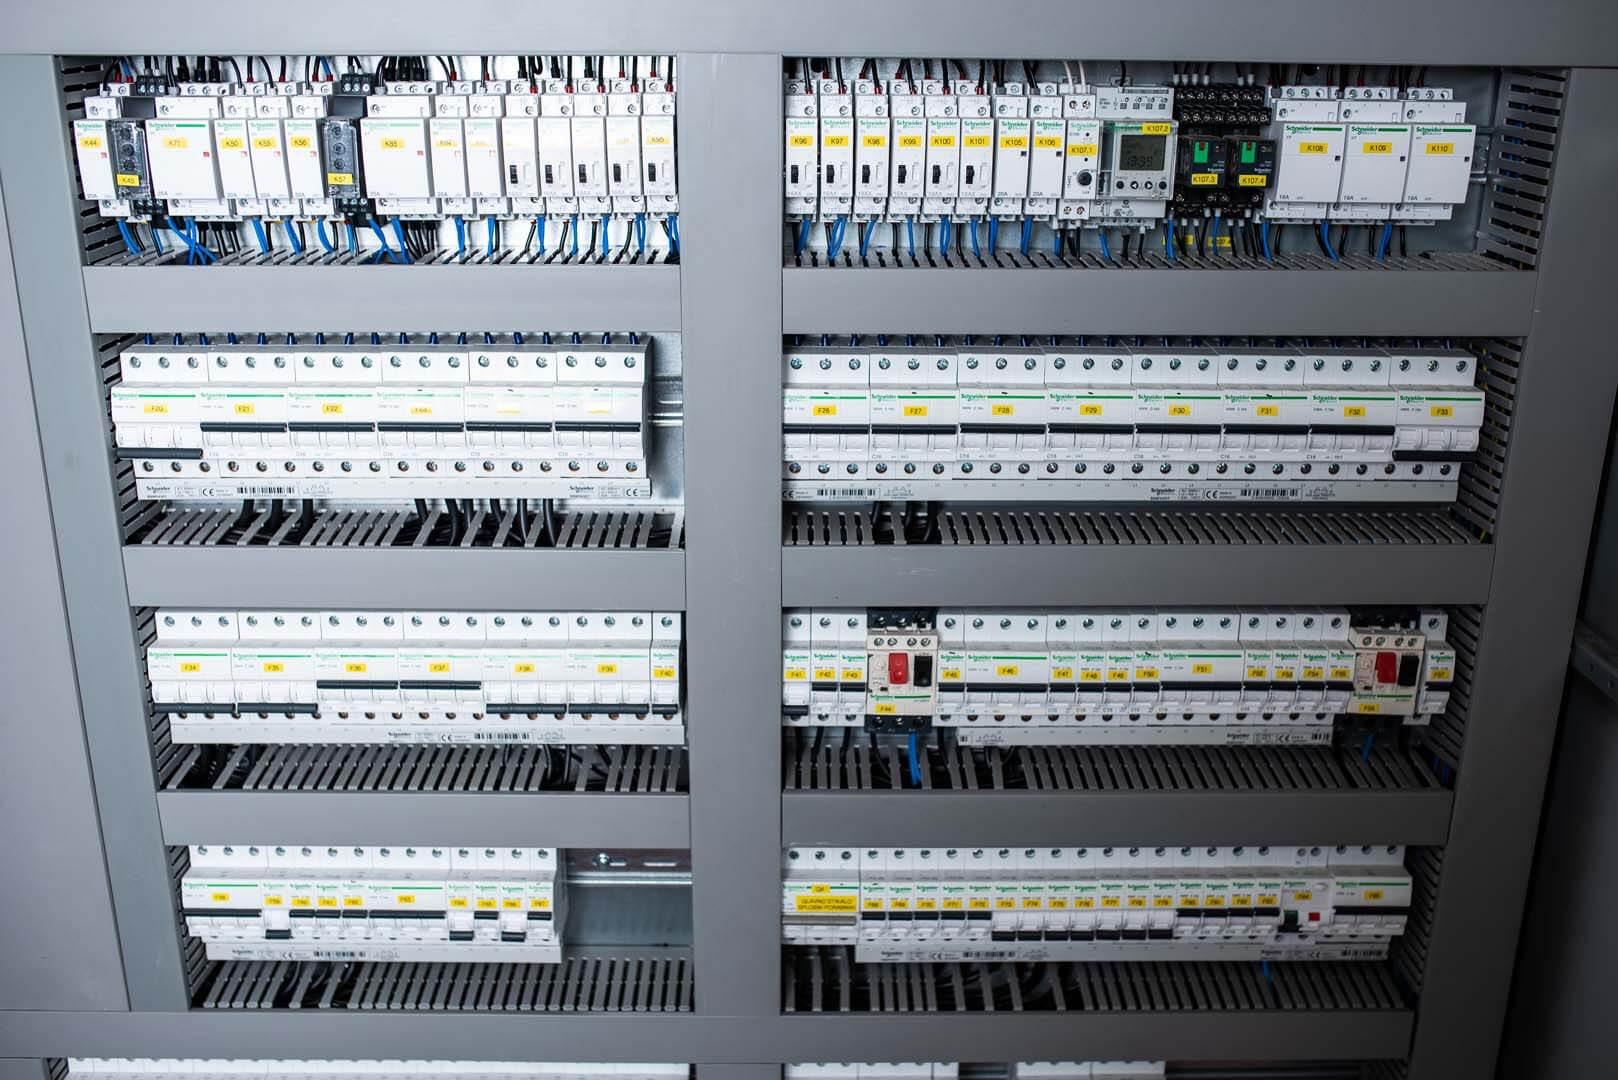 elektro omra - elektro instalacije